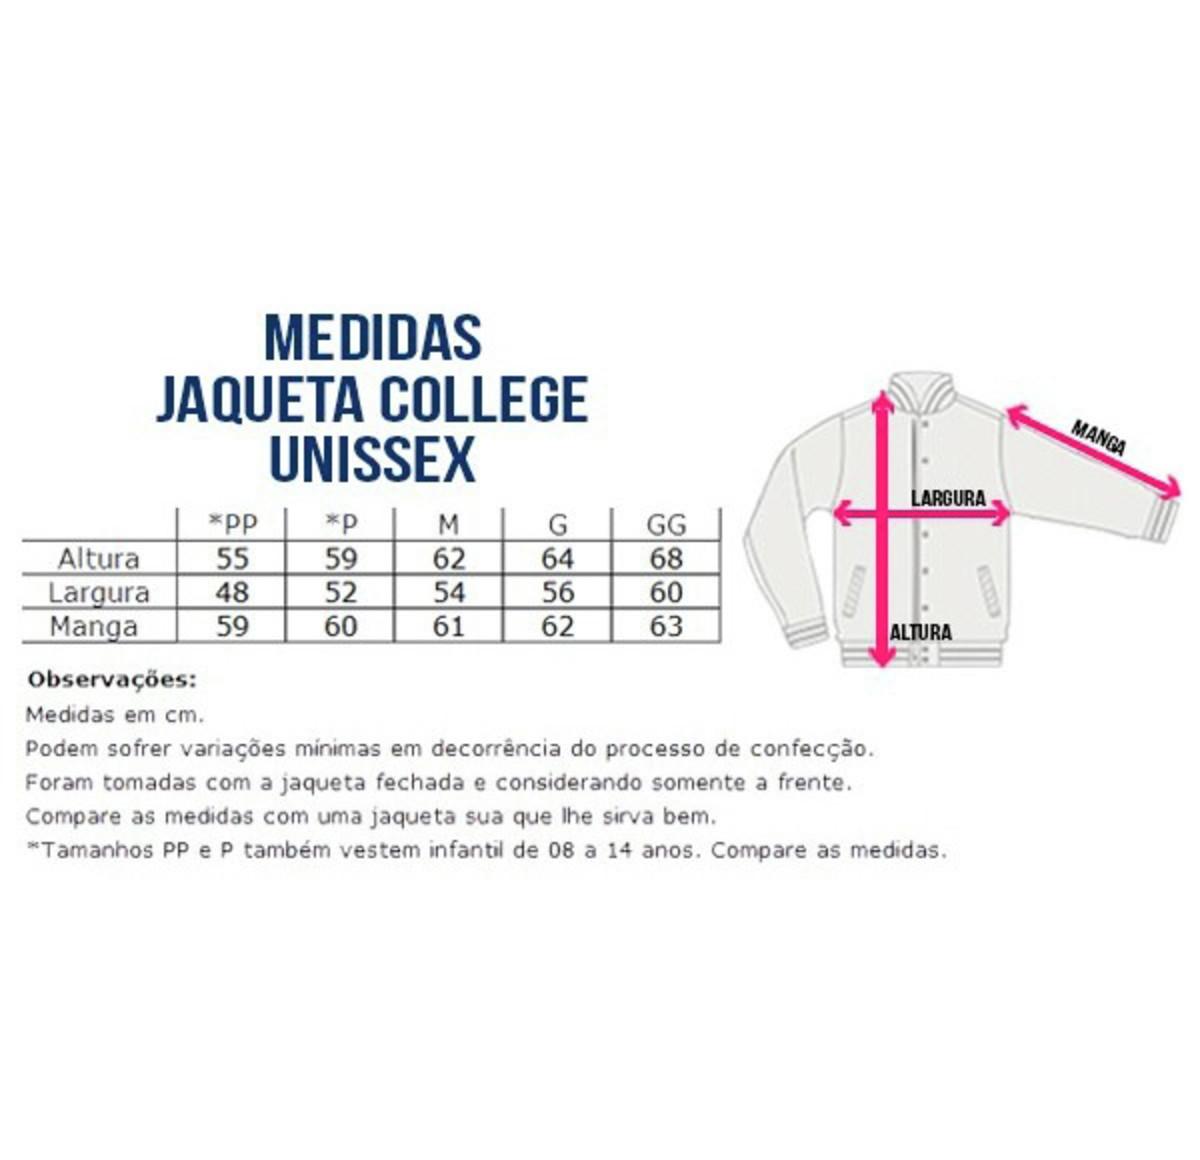 b4a939d3ba Jaqueta College Feminina Casaco Blusa Moletom Lisa Cinza no Elo7 ...